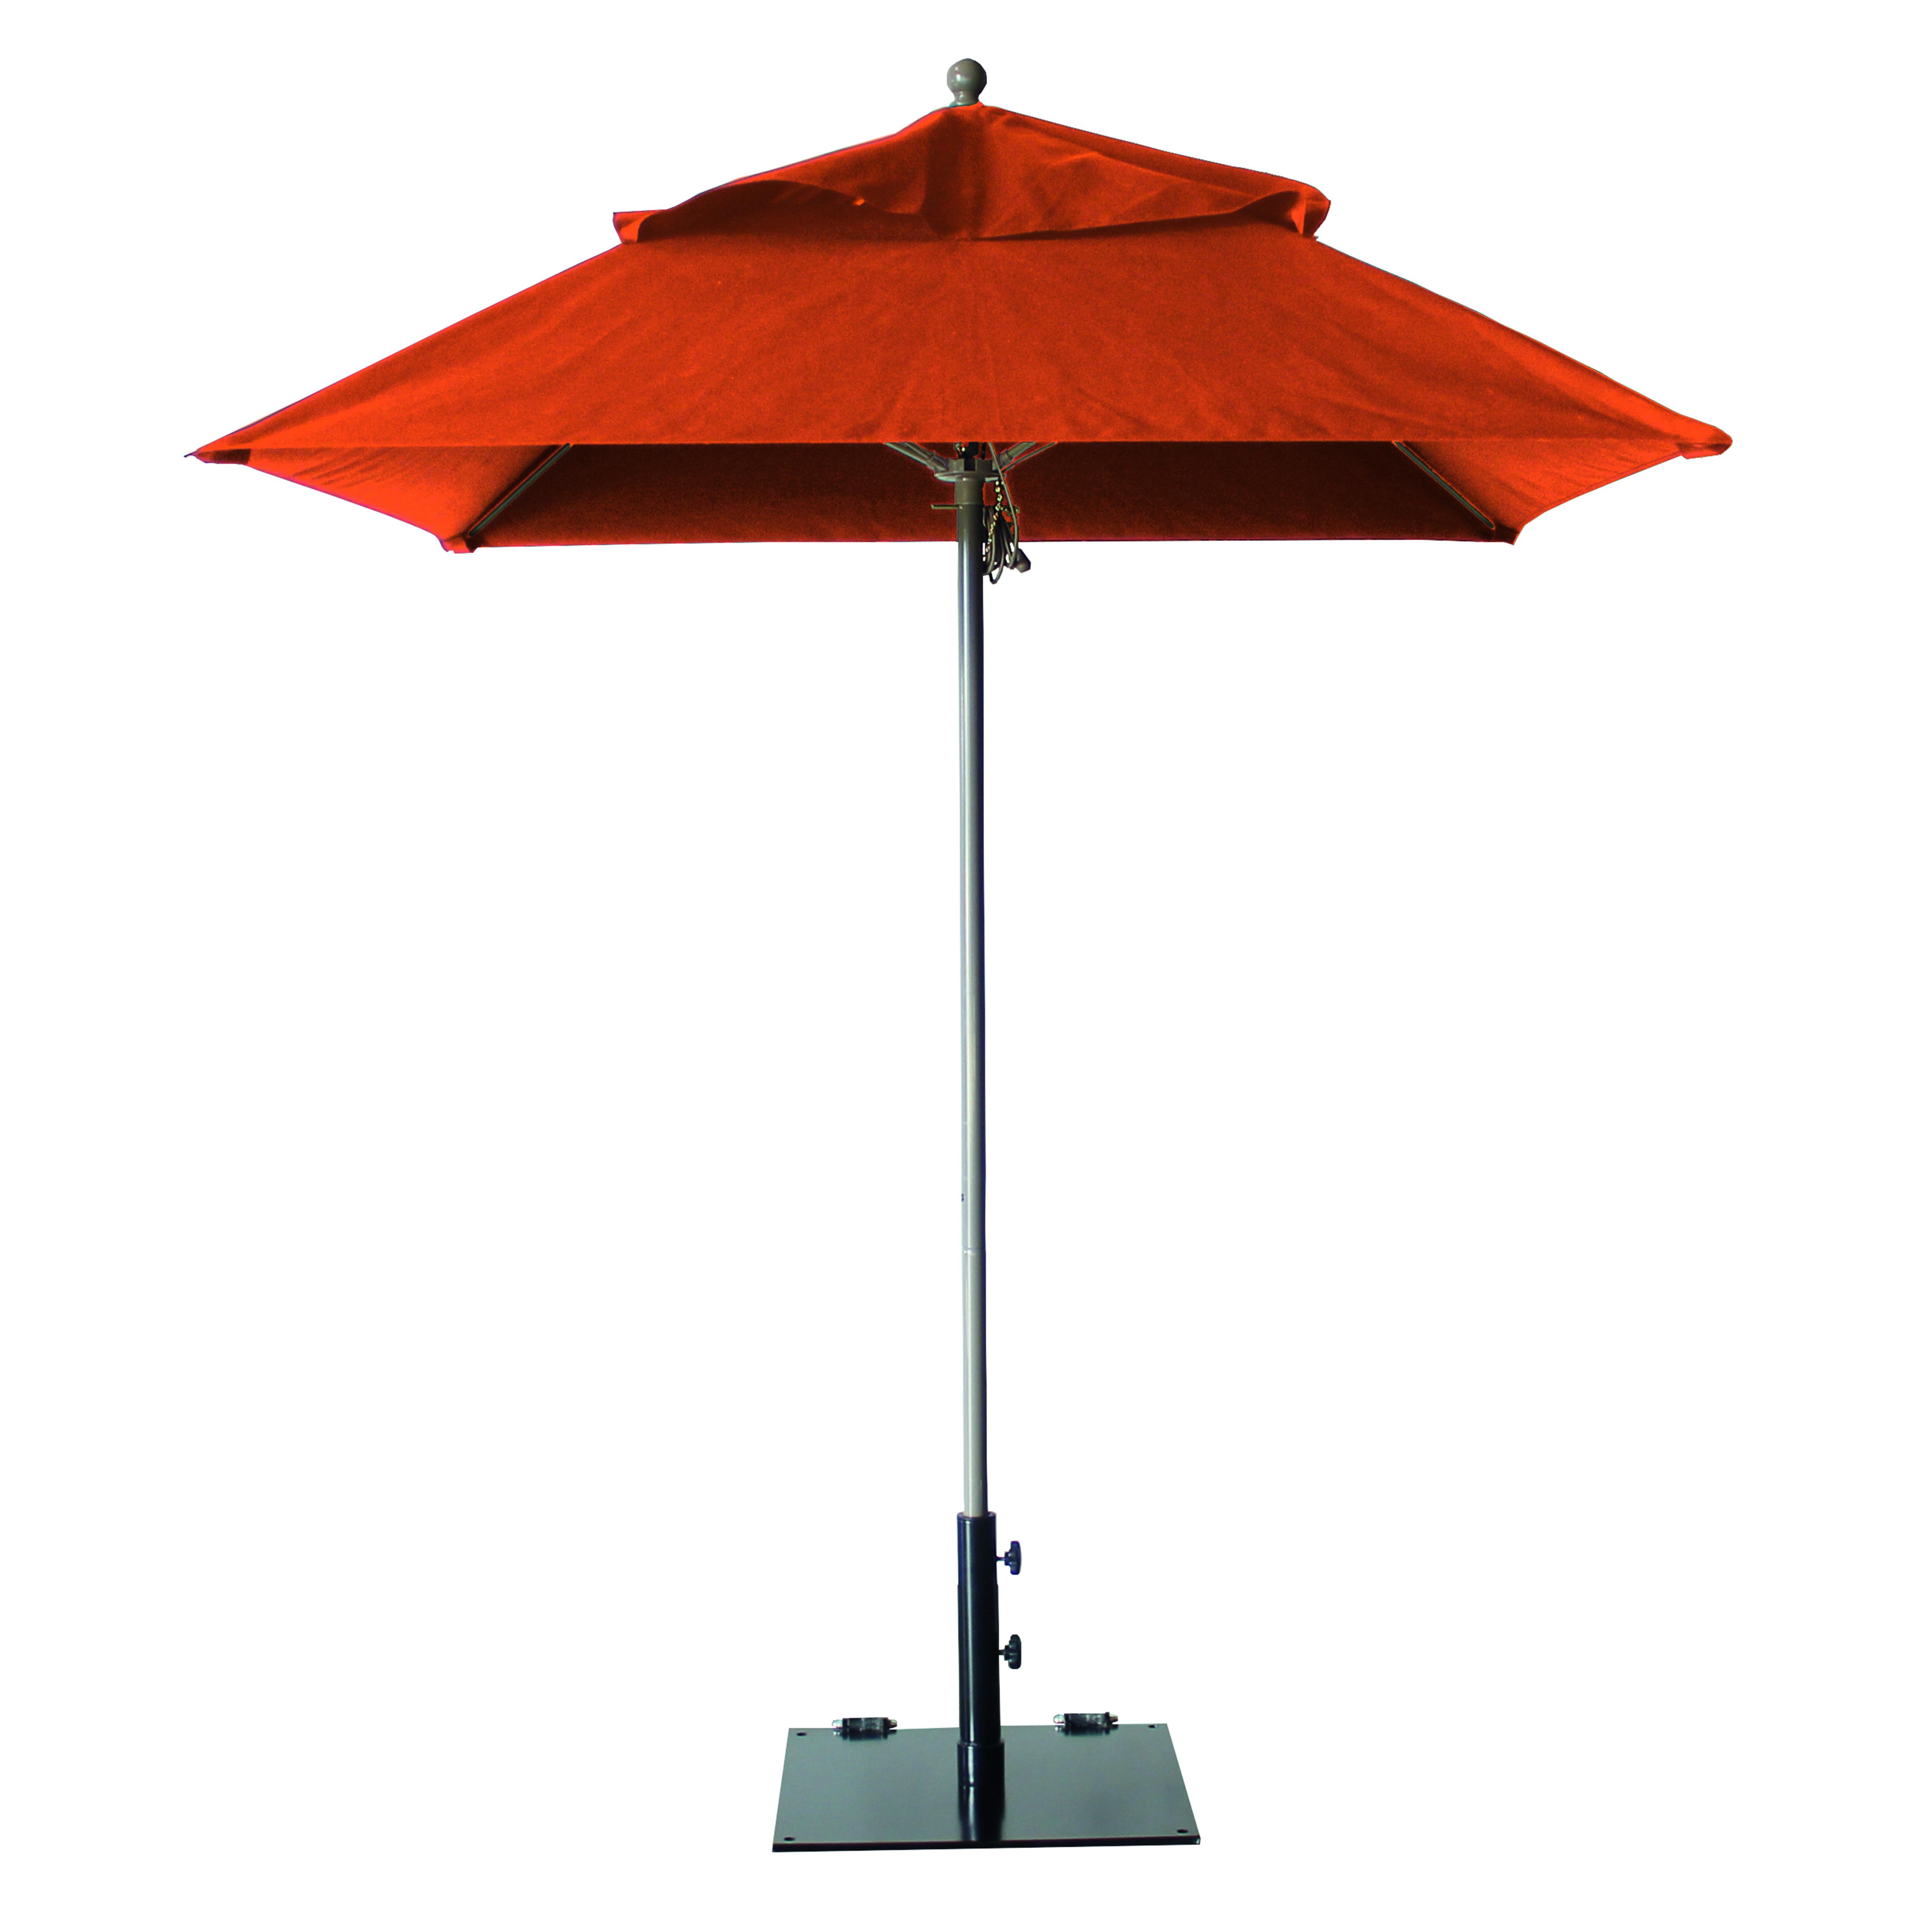 Grosfillex 98661931 umbrella